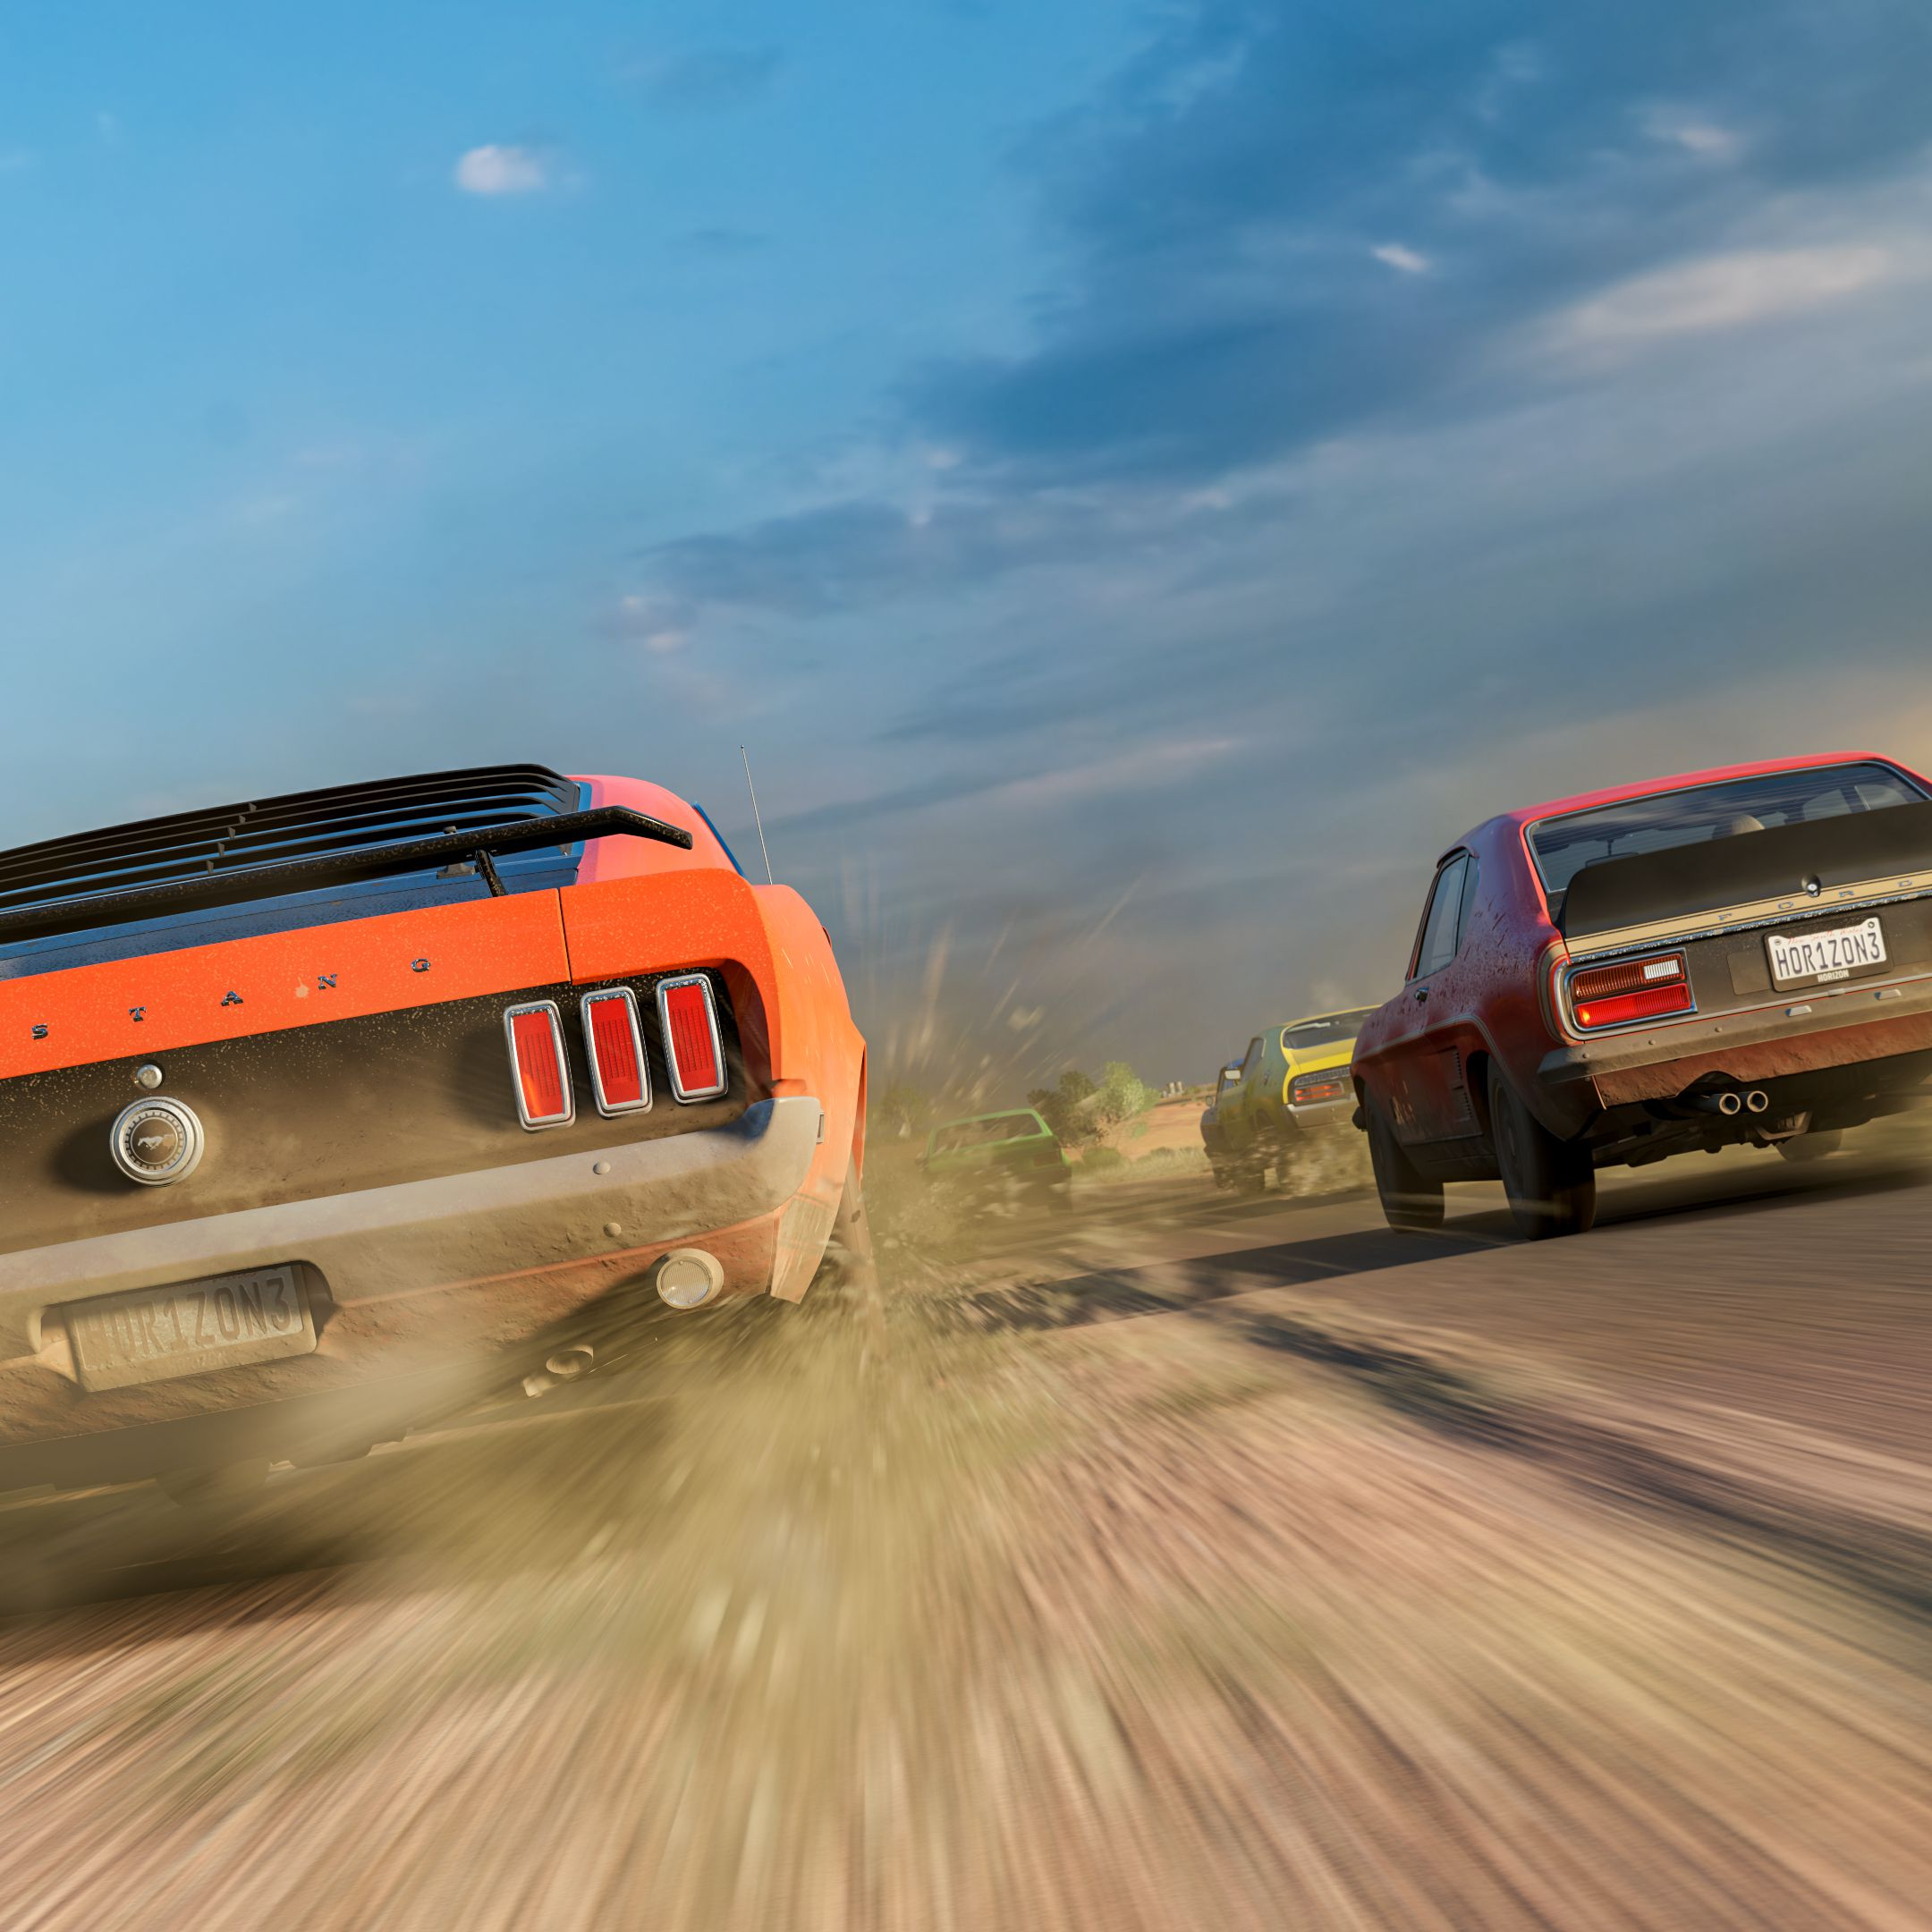 drag racing video games xbox 360